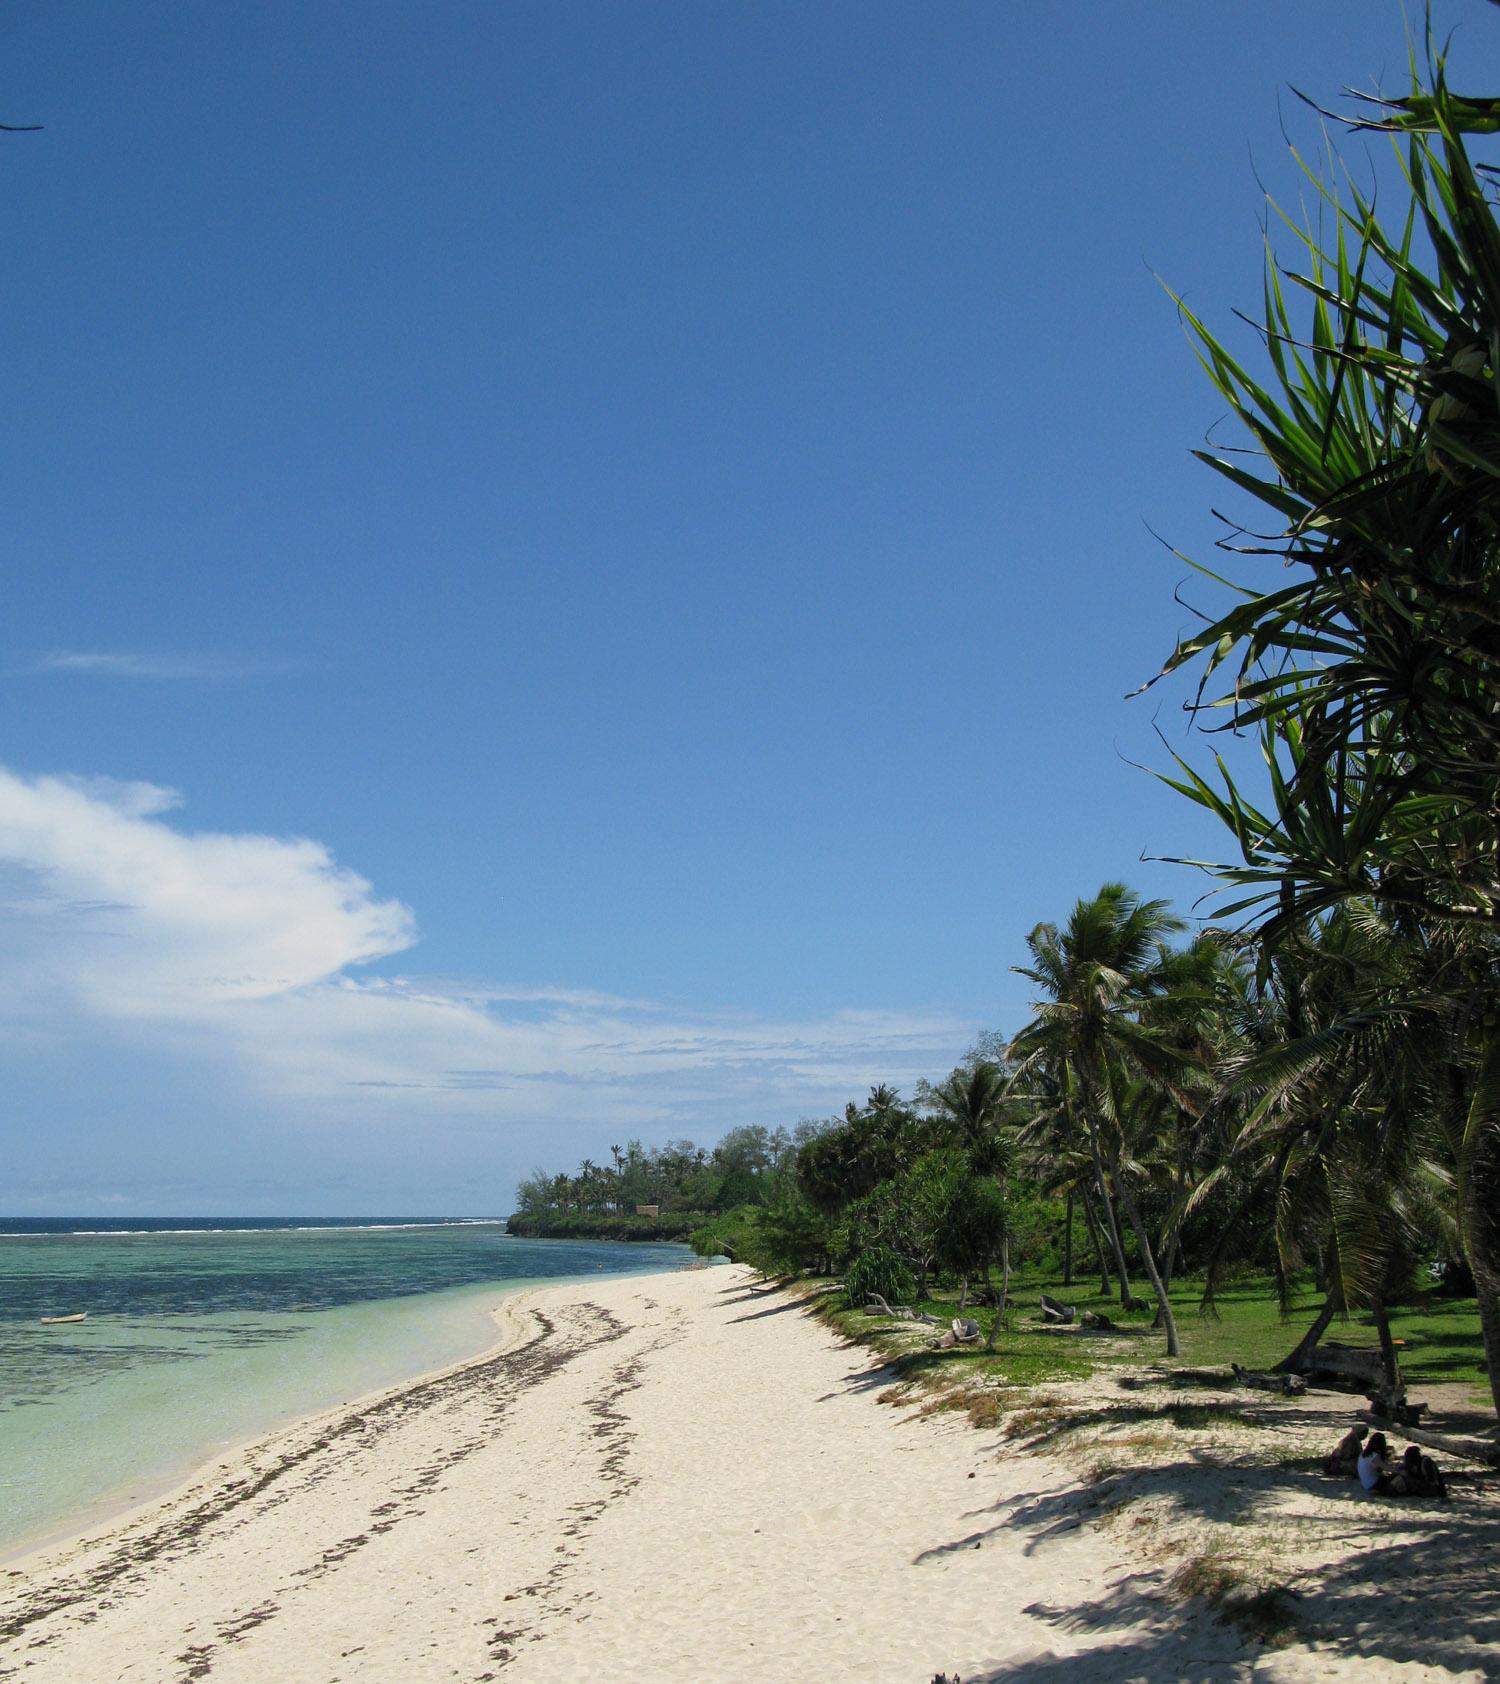 Sand Island Beach, low tide